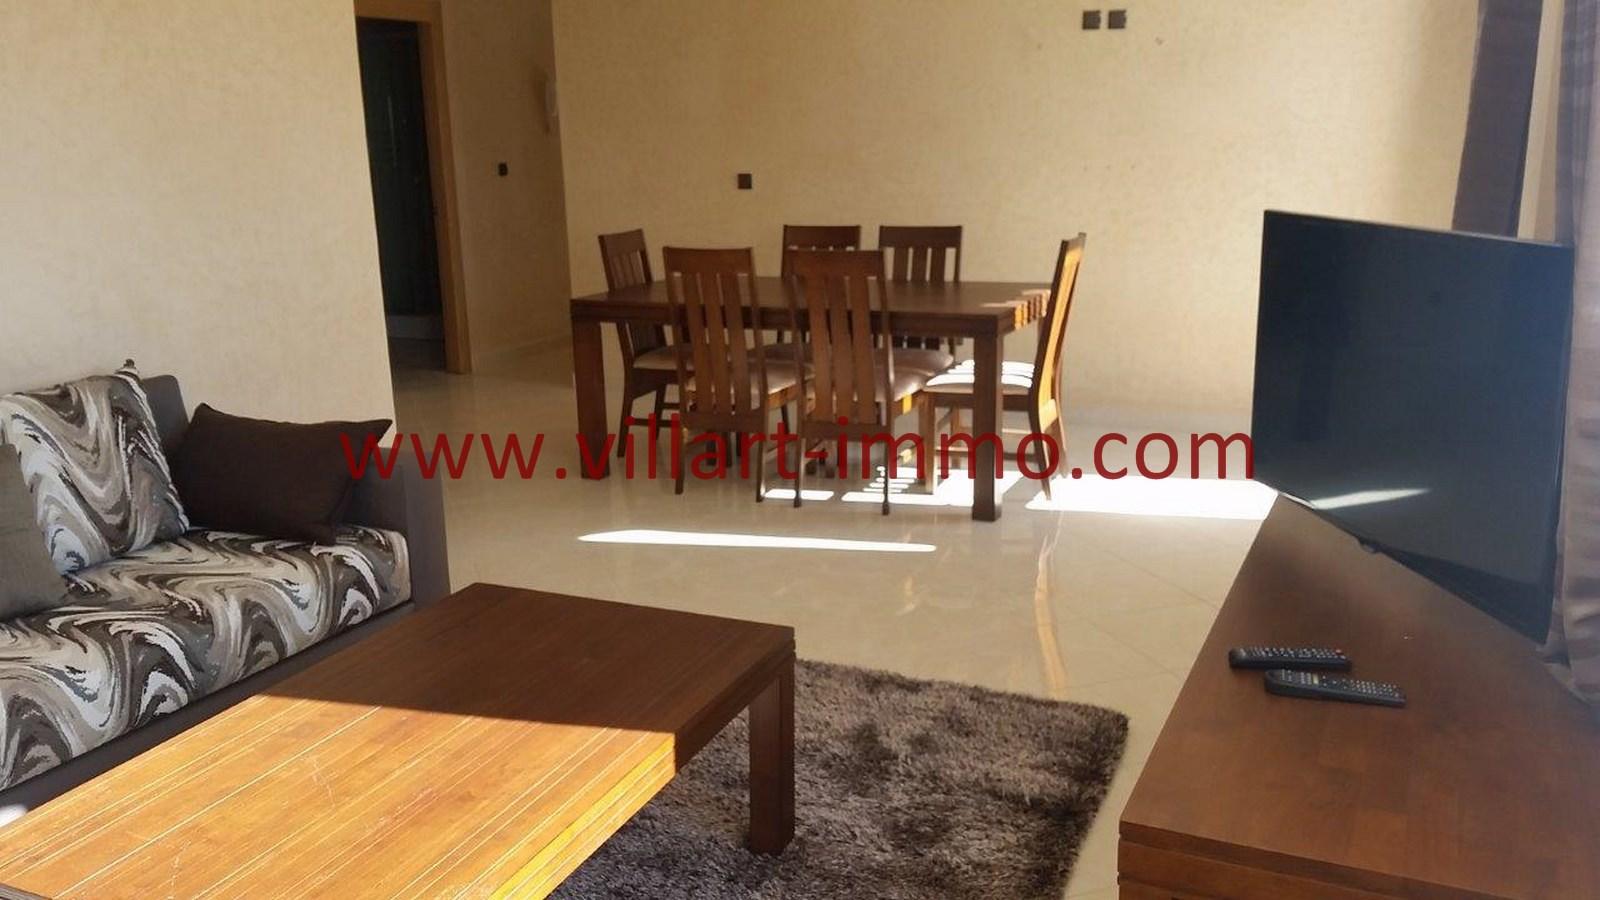 Location Appartement Meubl Tanger Avec Terrasse Zone